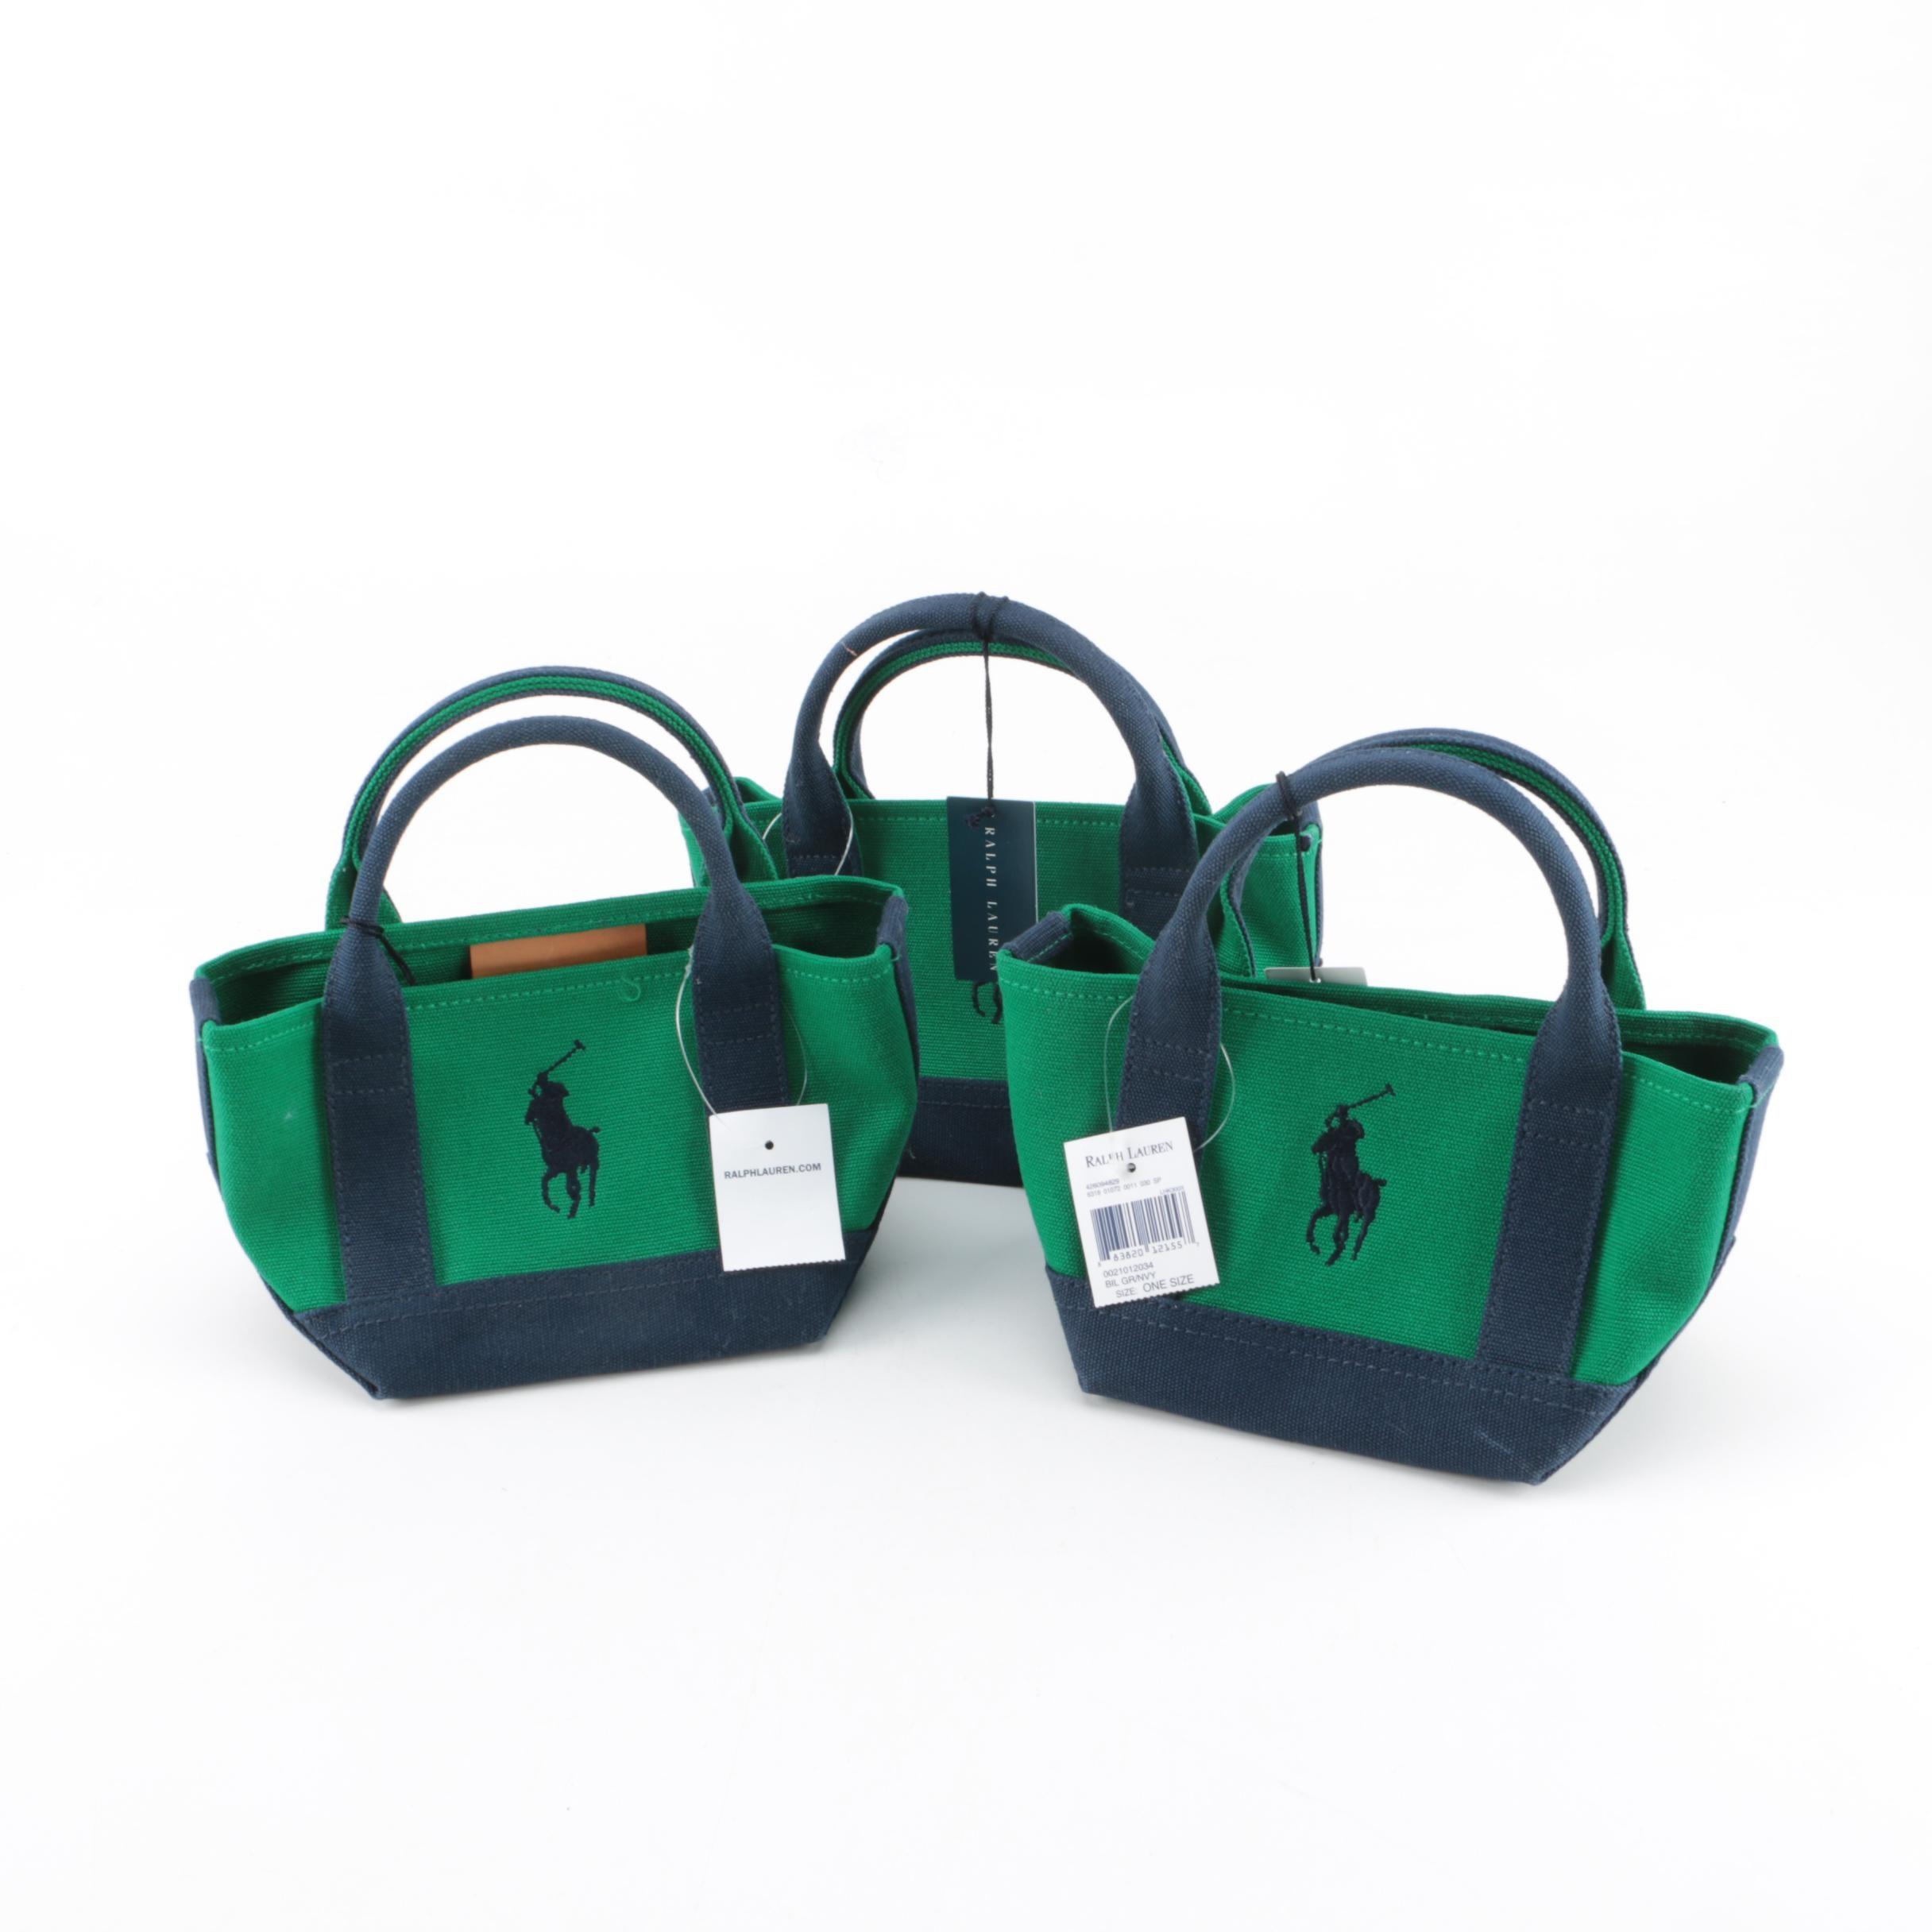 Ralph Lauren Mini Canvas Tote Bags